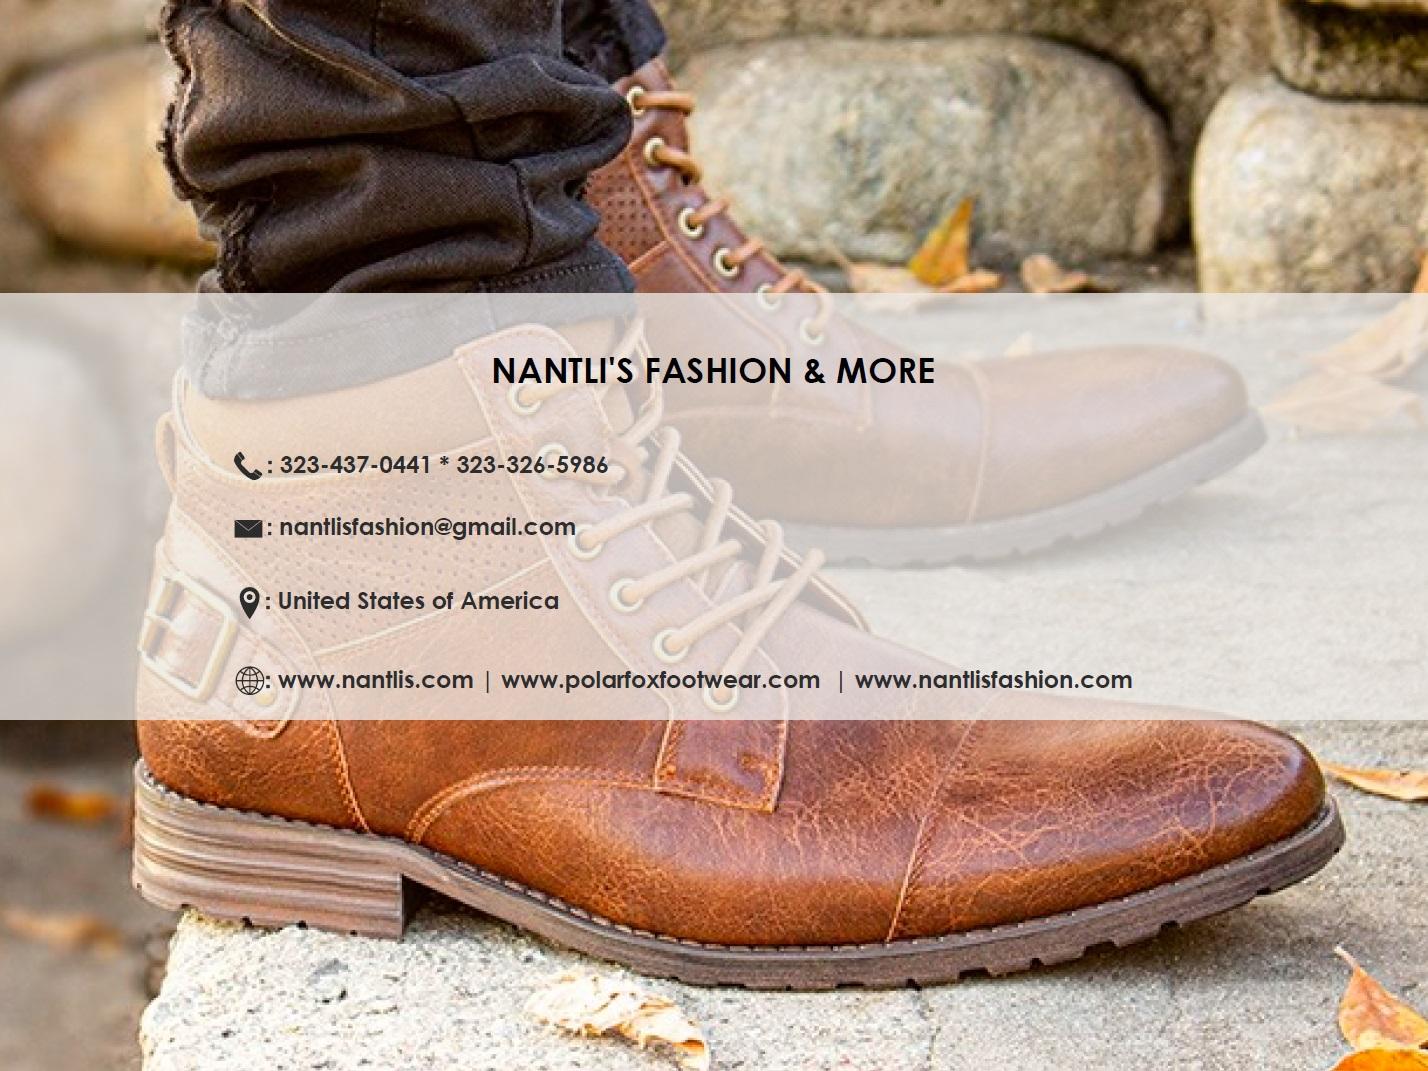 Nantlis Vol 43 Zapatos para Hombres Mayoreo Wholesale men shoes Catalogo Polar Fox Footwear_Page_14